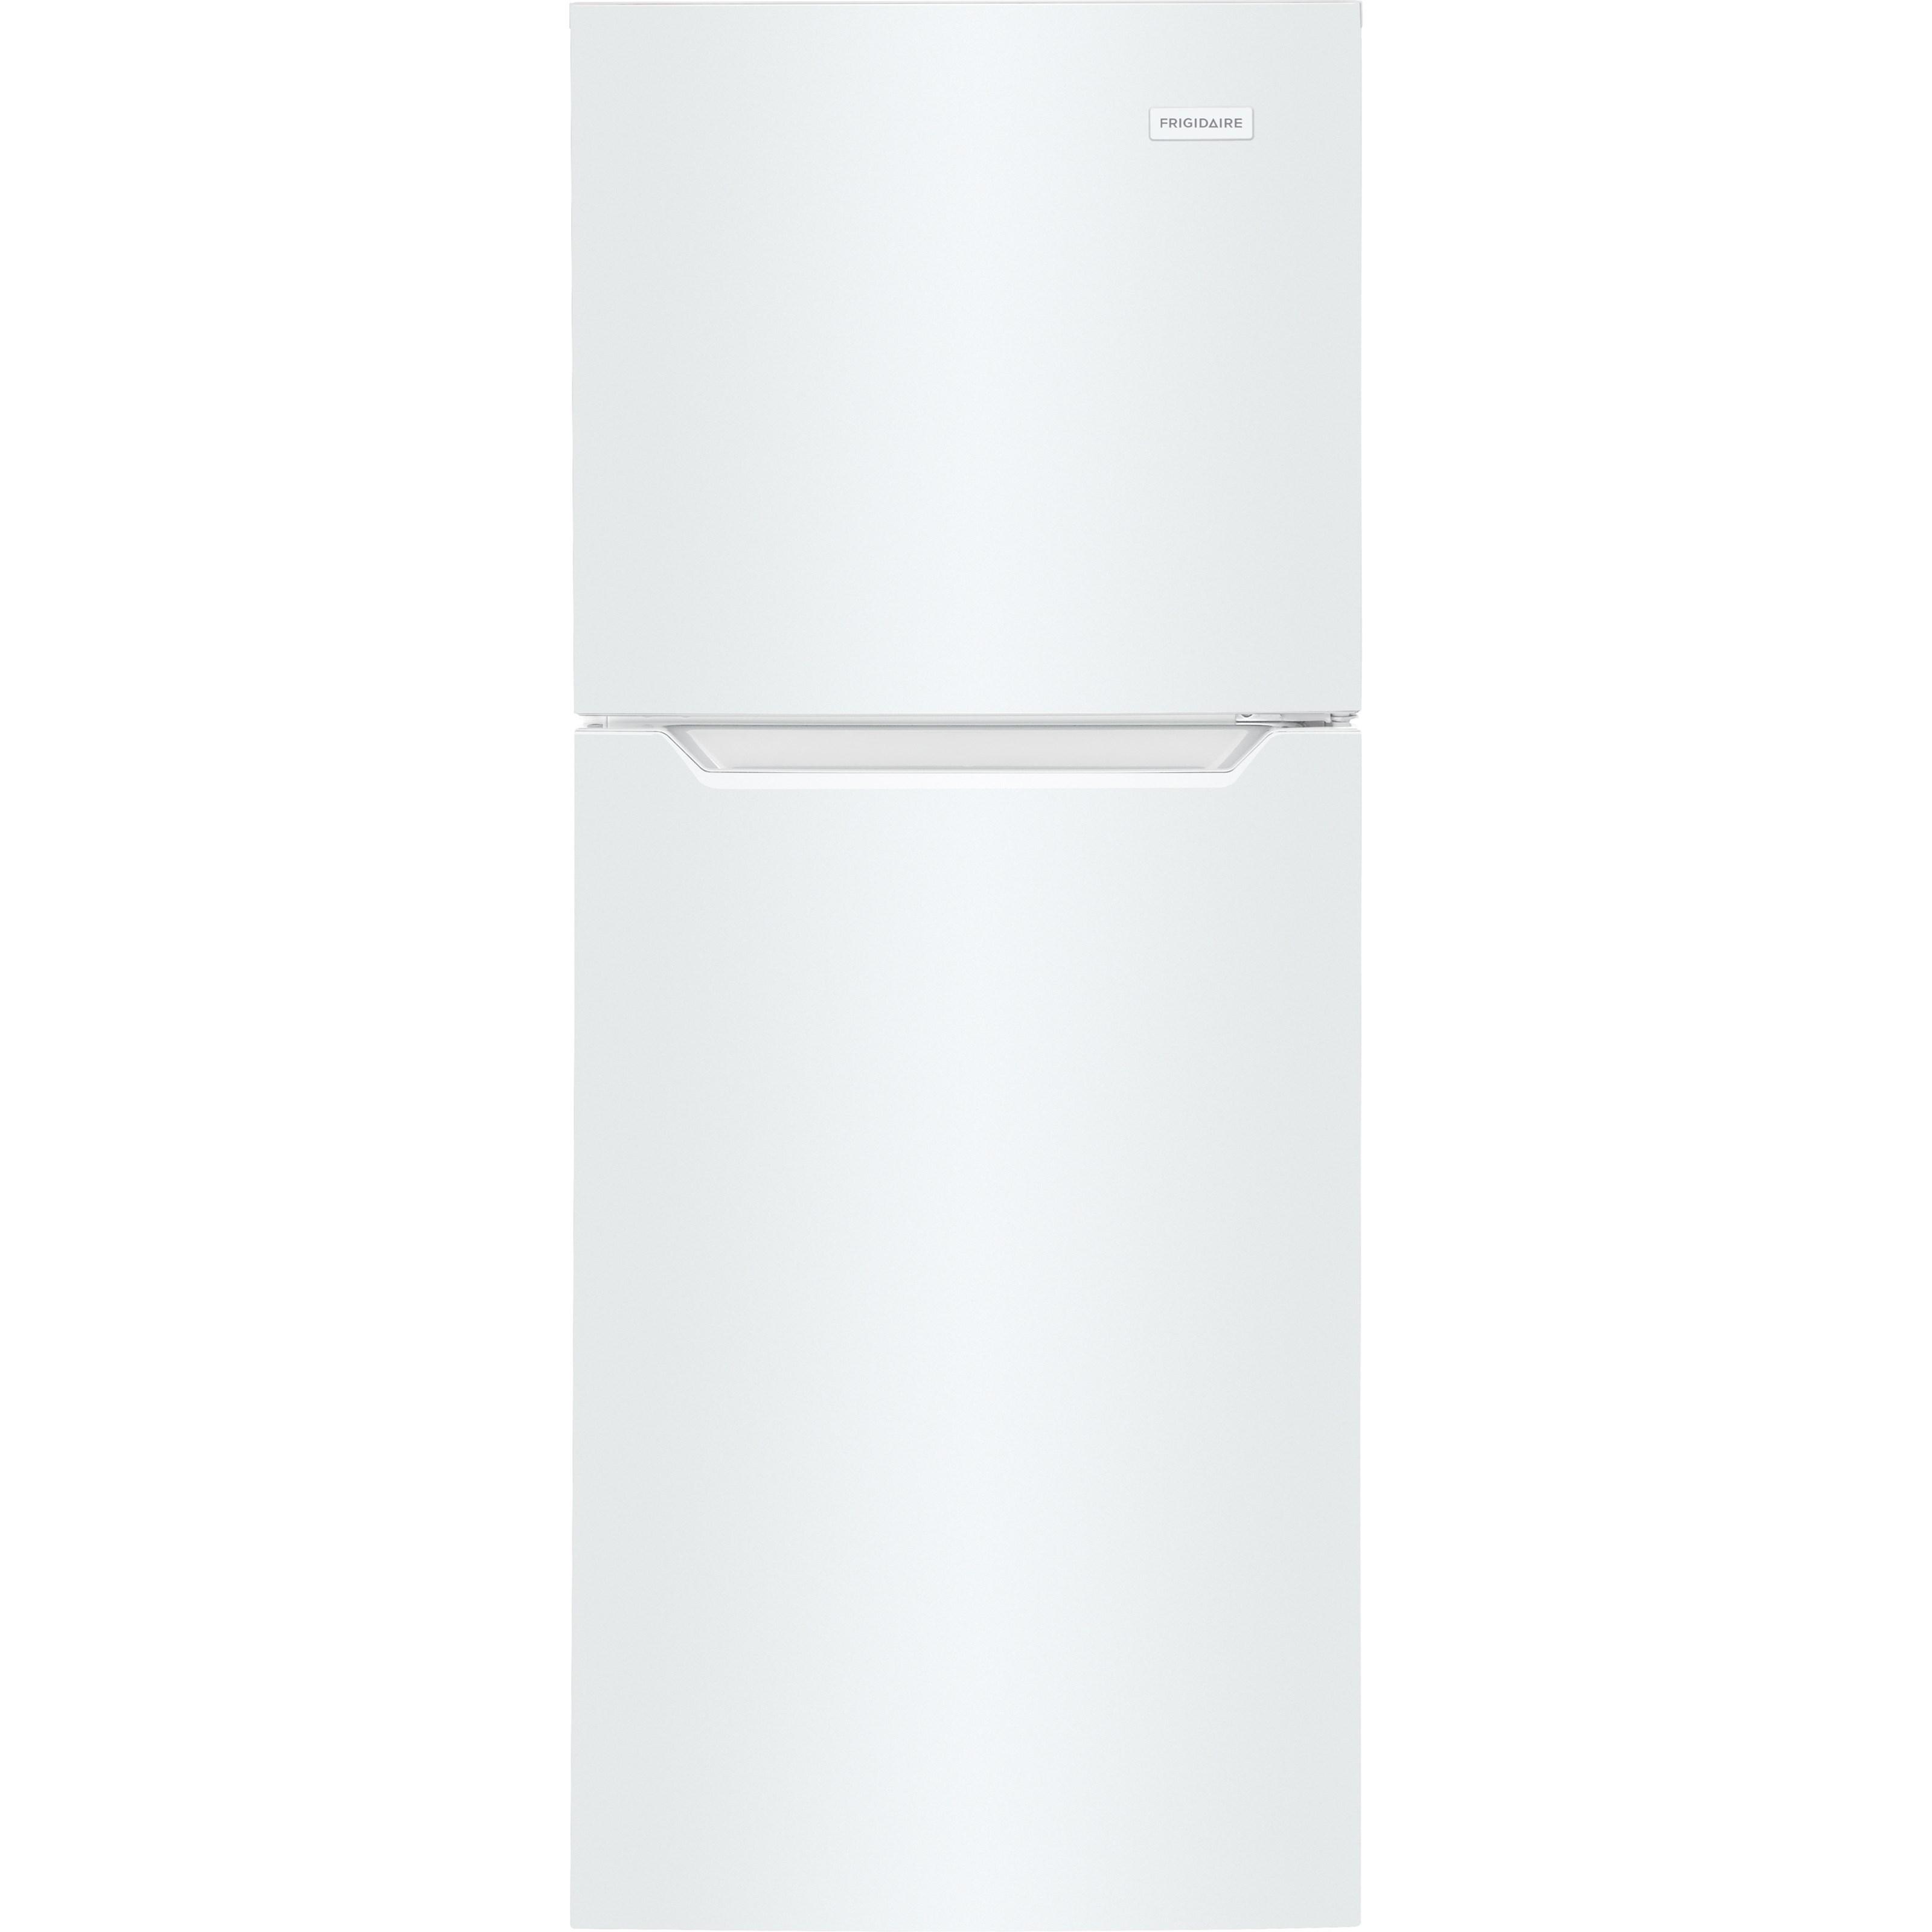 11.6 Cu. Ft. Top Freezer Refrigerator